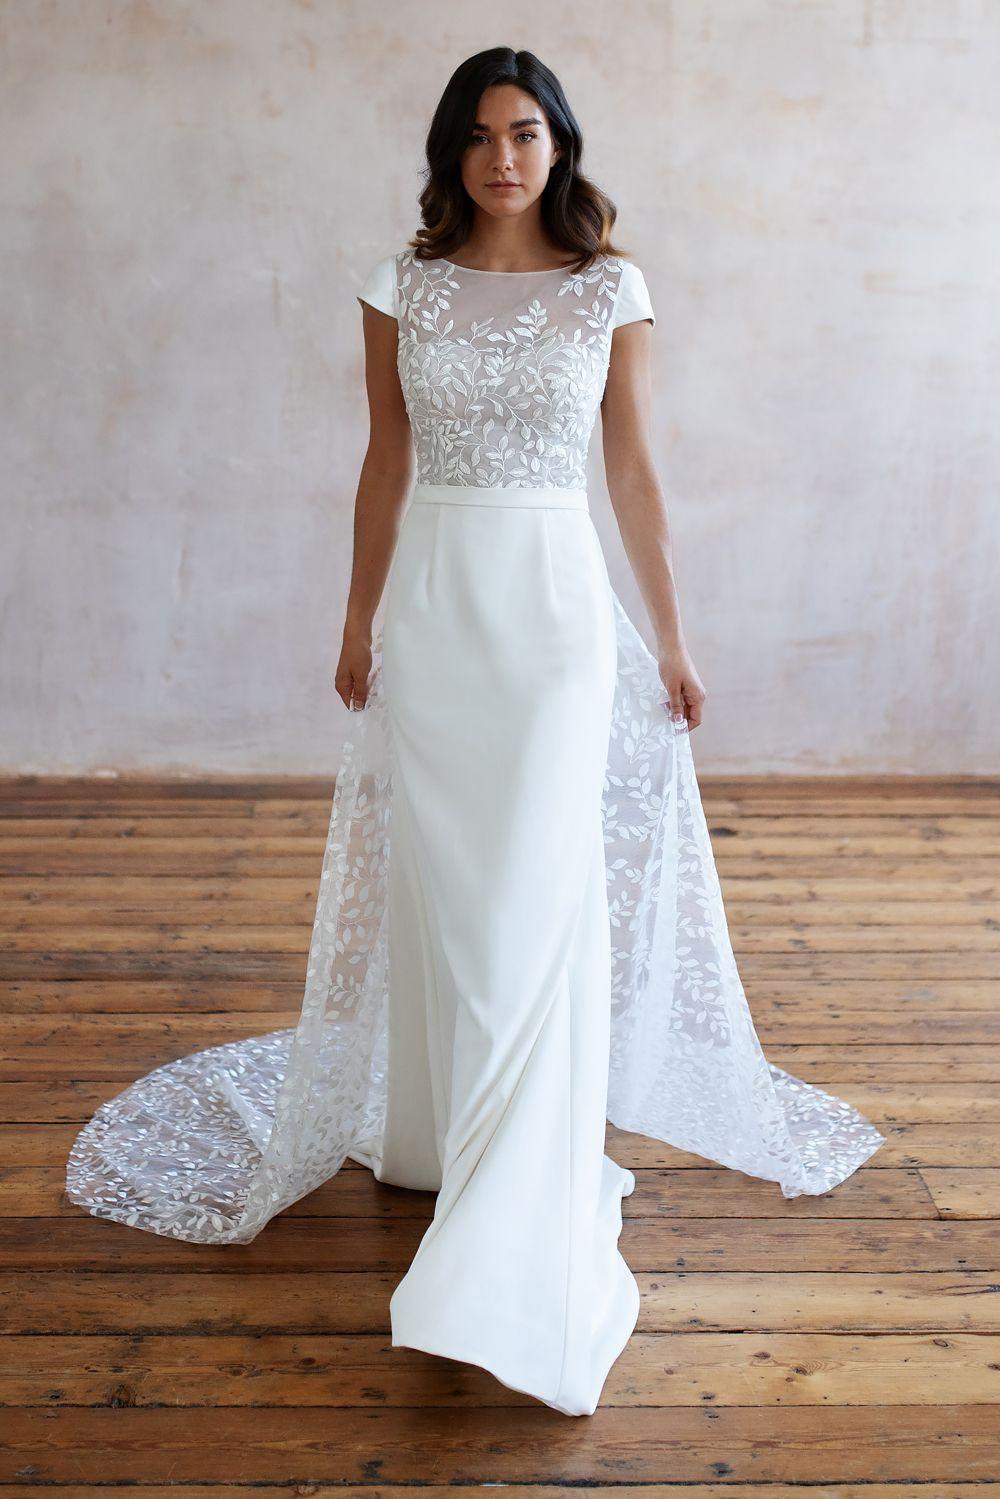 Wedding Dresses Lace Bridal Shops Near Me Bridal Shops LondonLace Wedding Dresses Wedding Dress Lace Lace Wedding Dress Wedding Dresses Cap Sleeve Wedding Dress 6 3